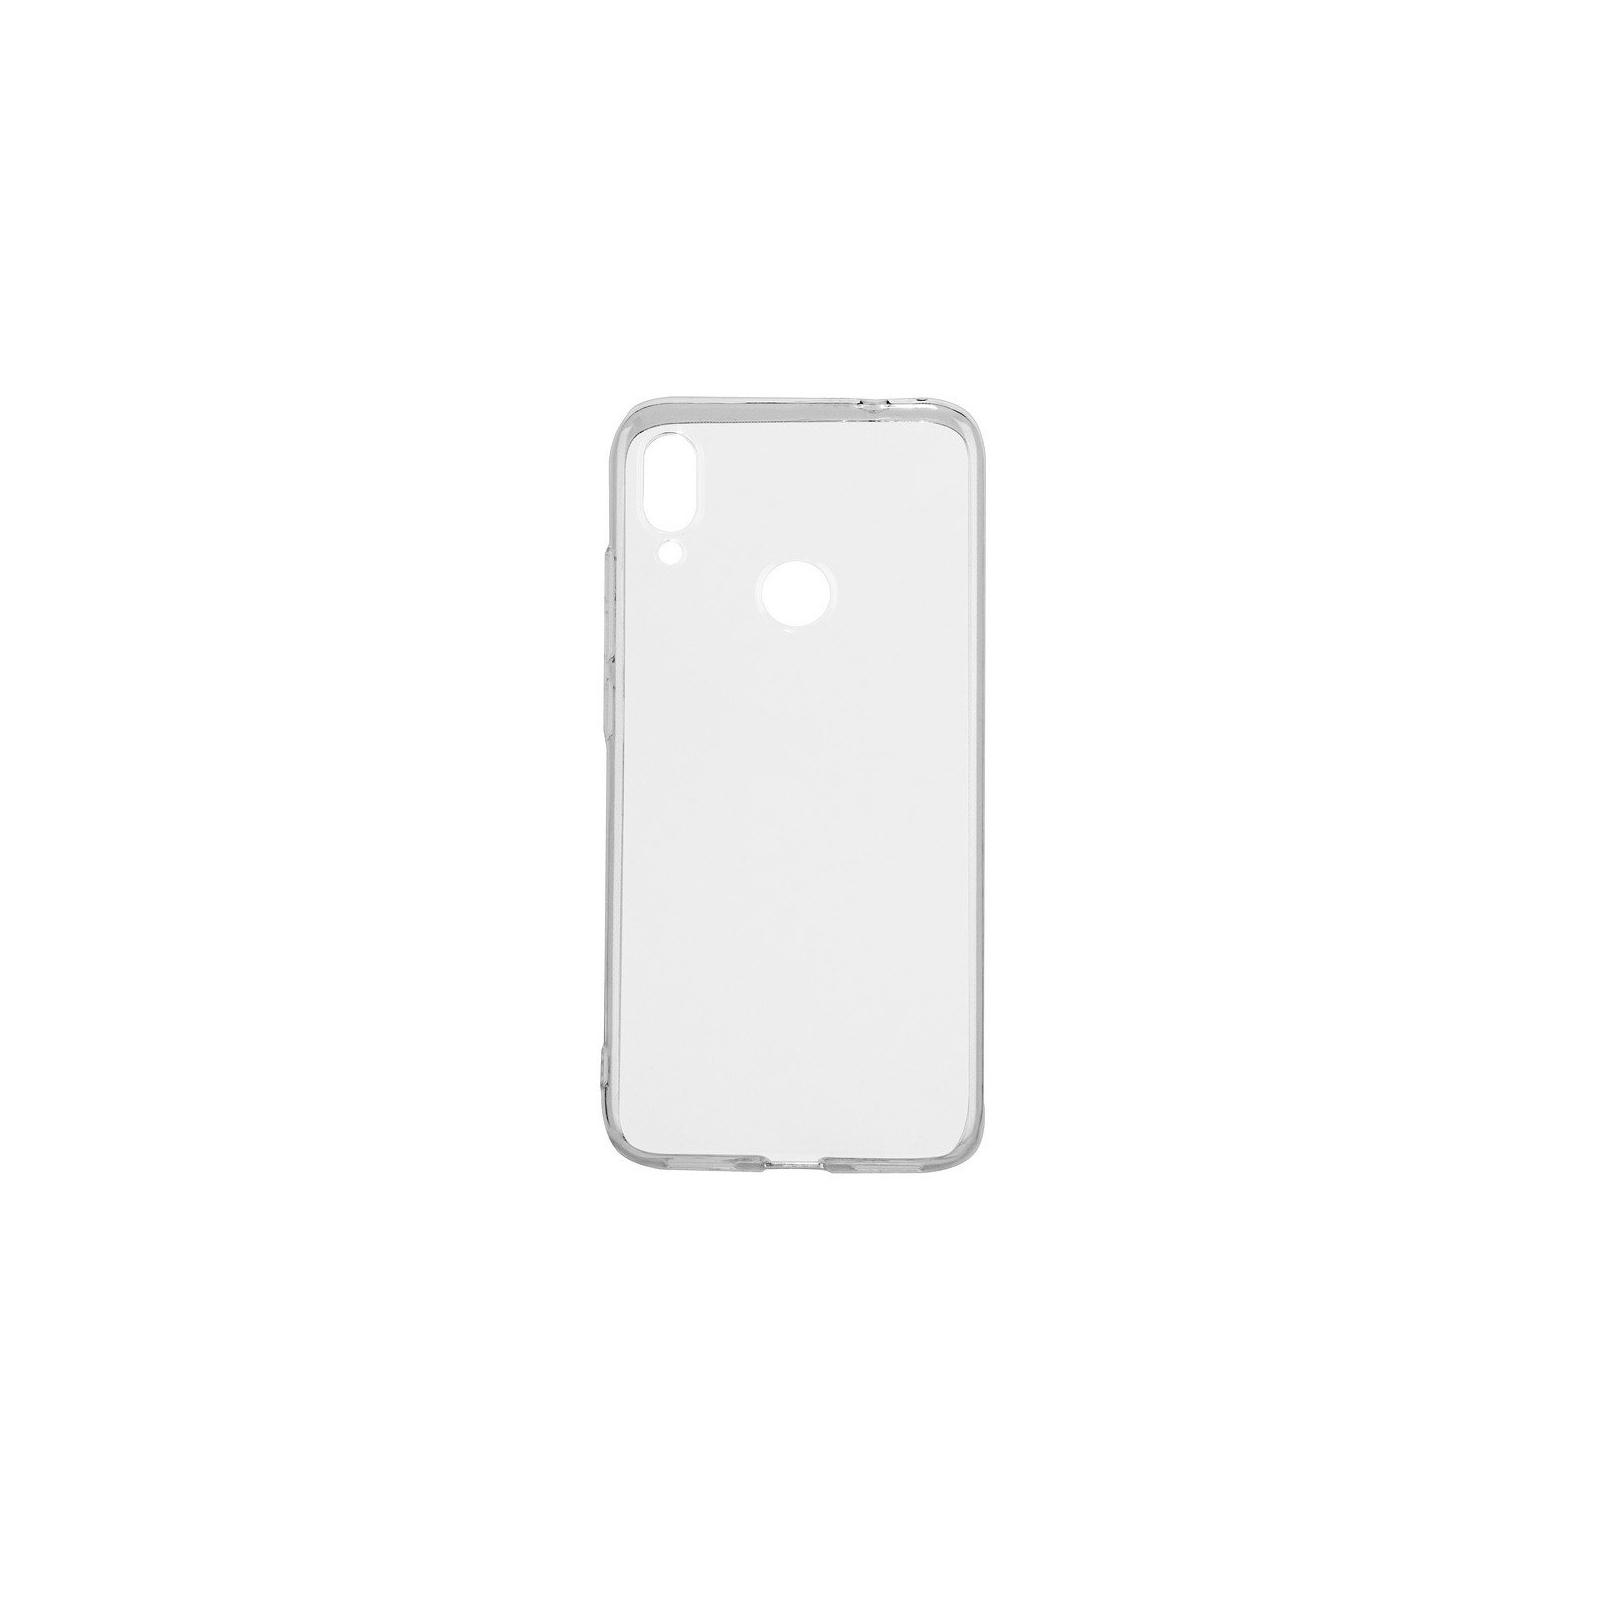 Чехол для моб. телефона ColorWay ColorWay TPU case for Xiaomi Redmi Note 7 (CW-CTBXRN7)